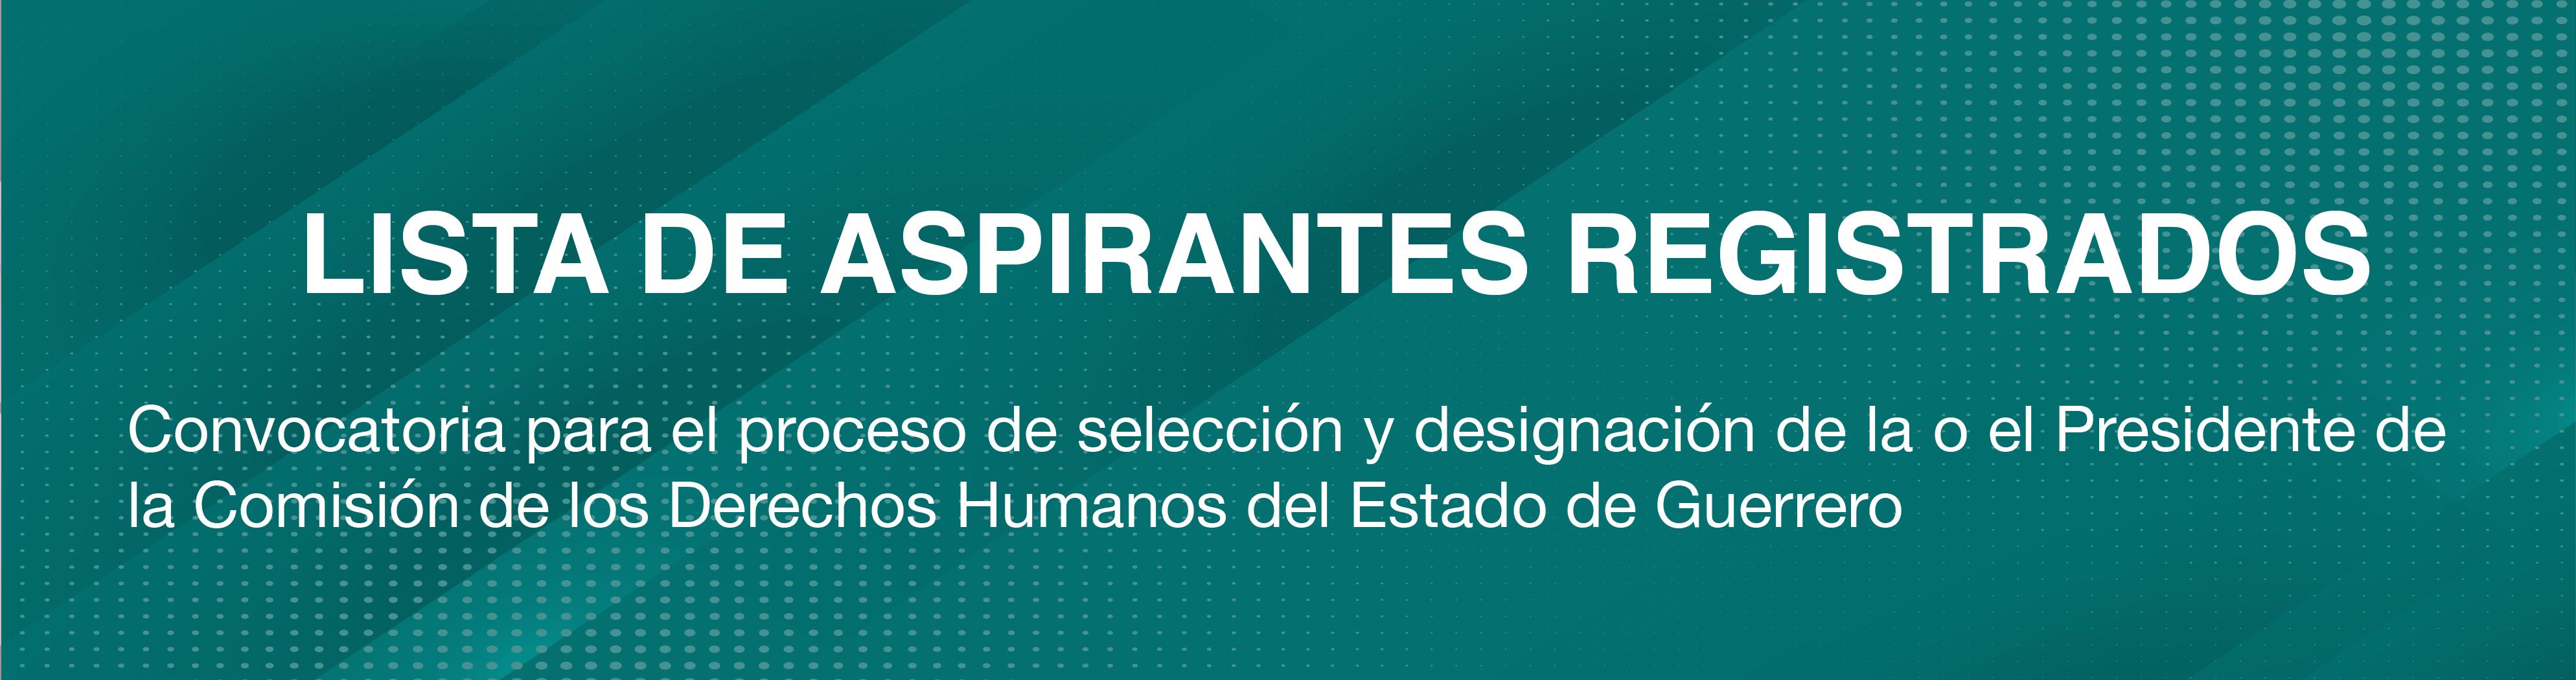 http://congresogro.gob.mx/62/inicio/wp-content/uploads/2021/04/lista-aspirantes-derechos-humanos.png